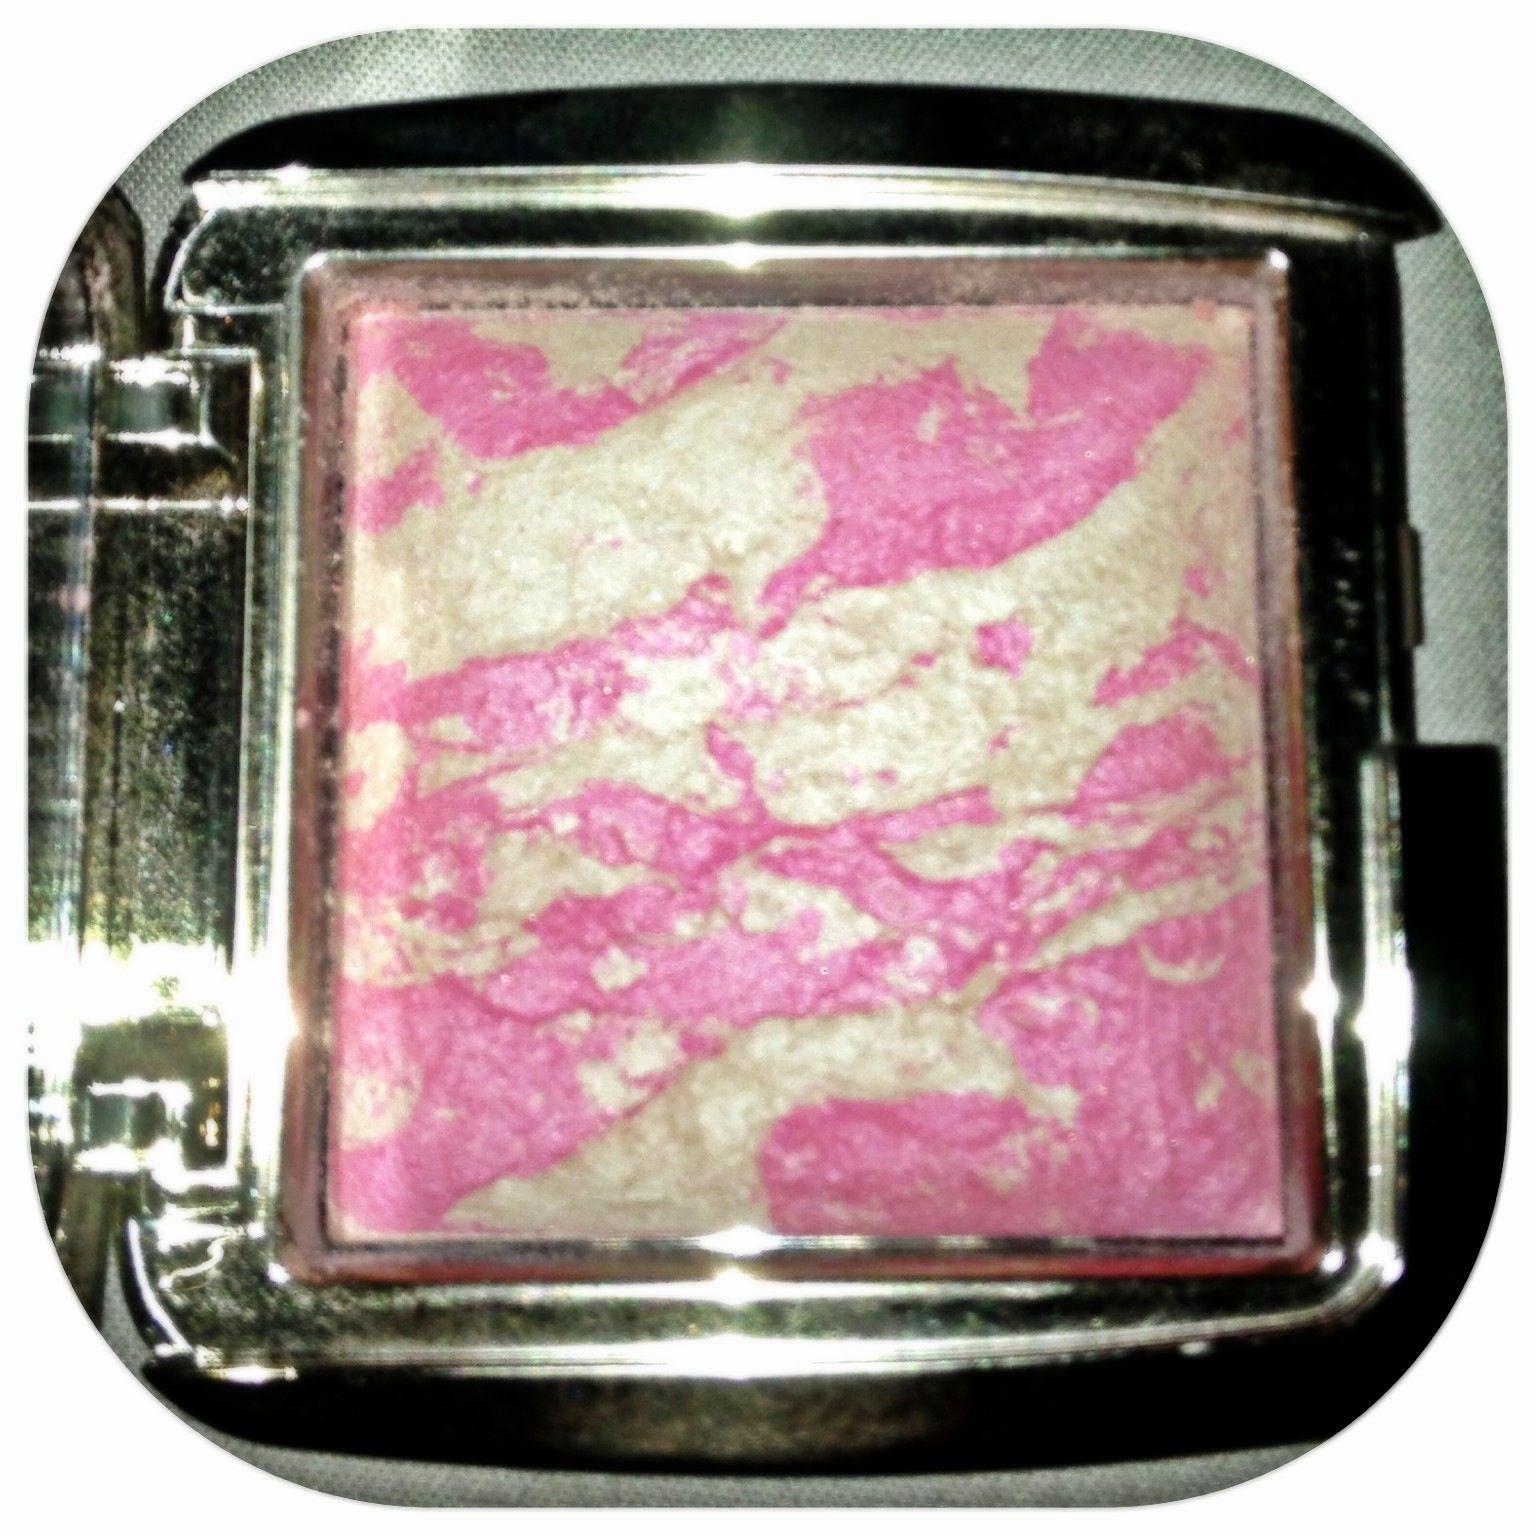 Ambient Lighting Blush Color - Luminous Flush